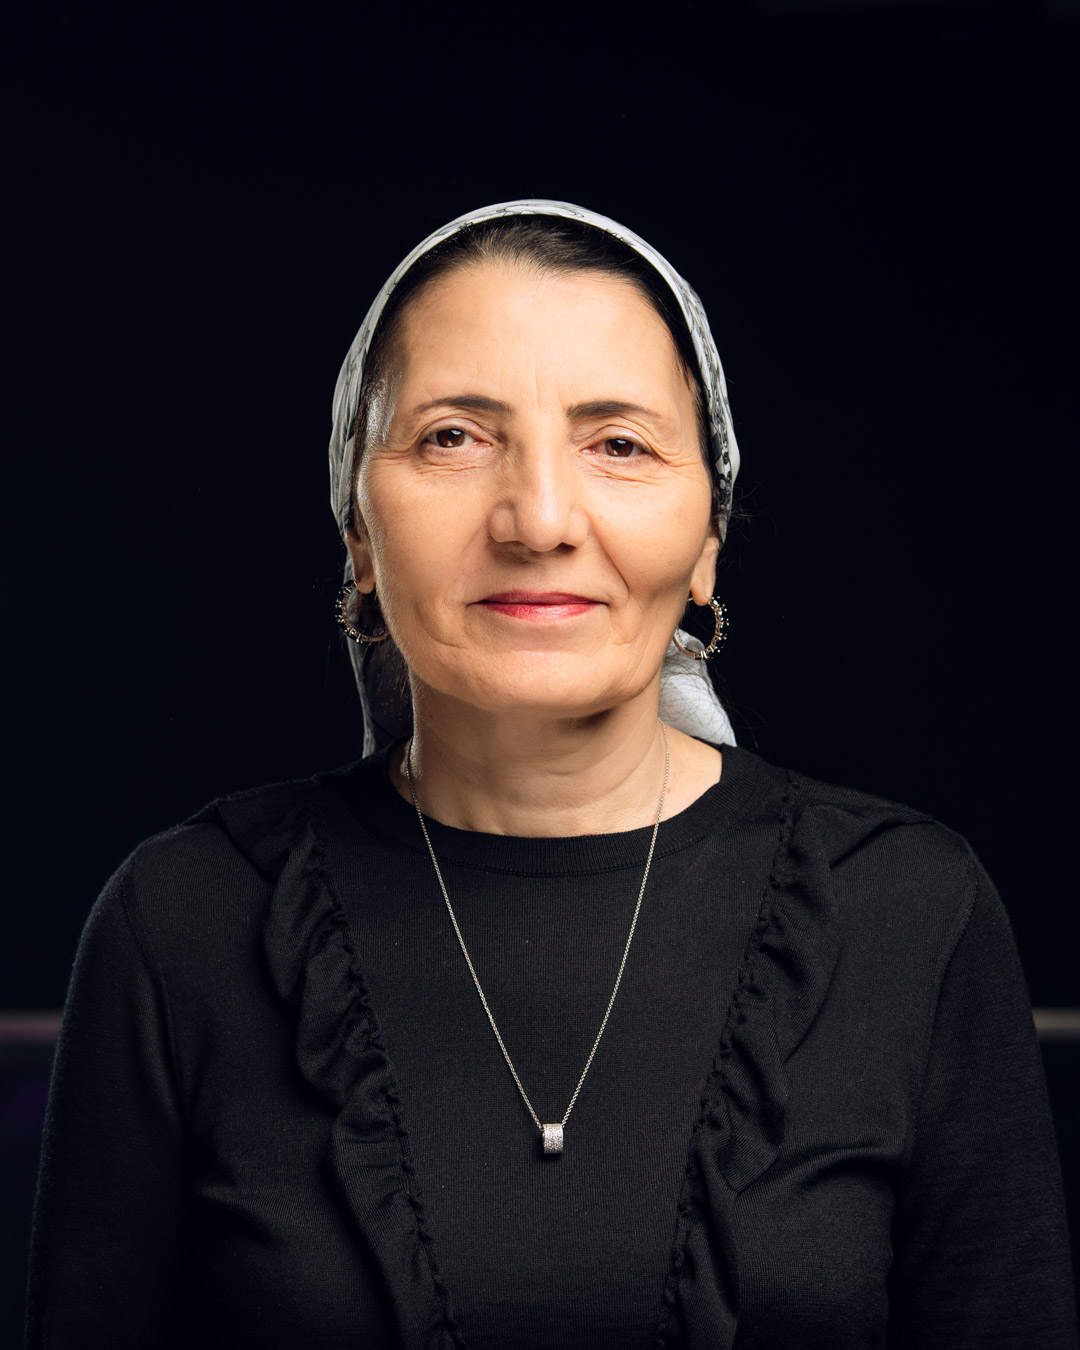 Алисултанова Эсмира Докуевна